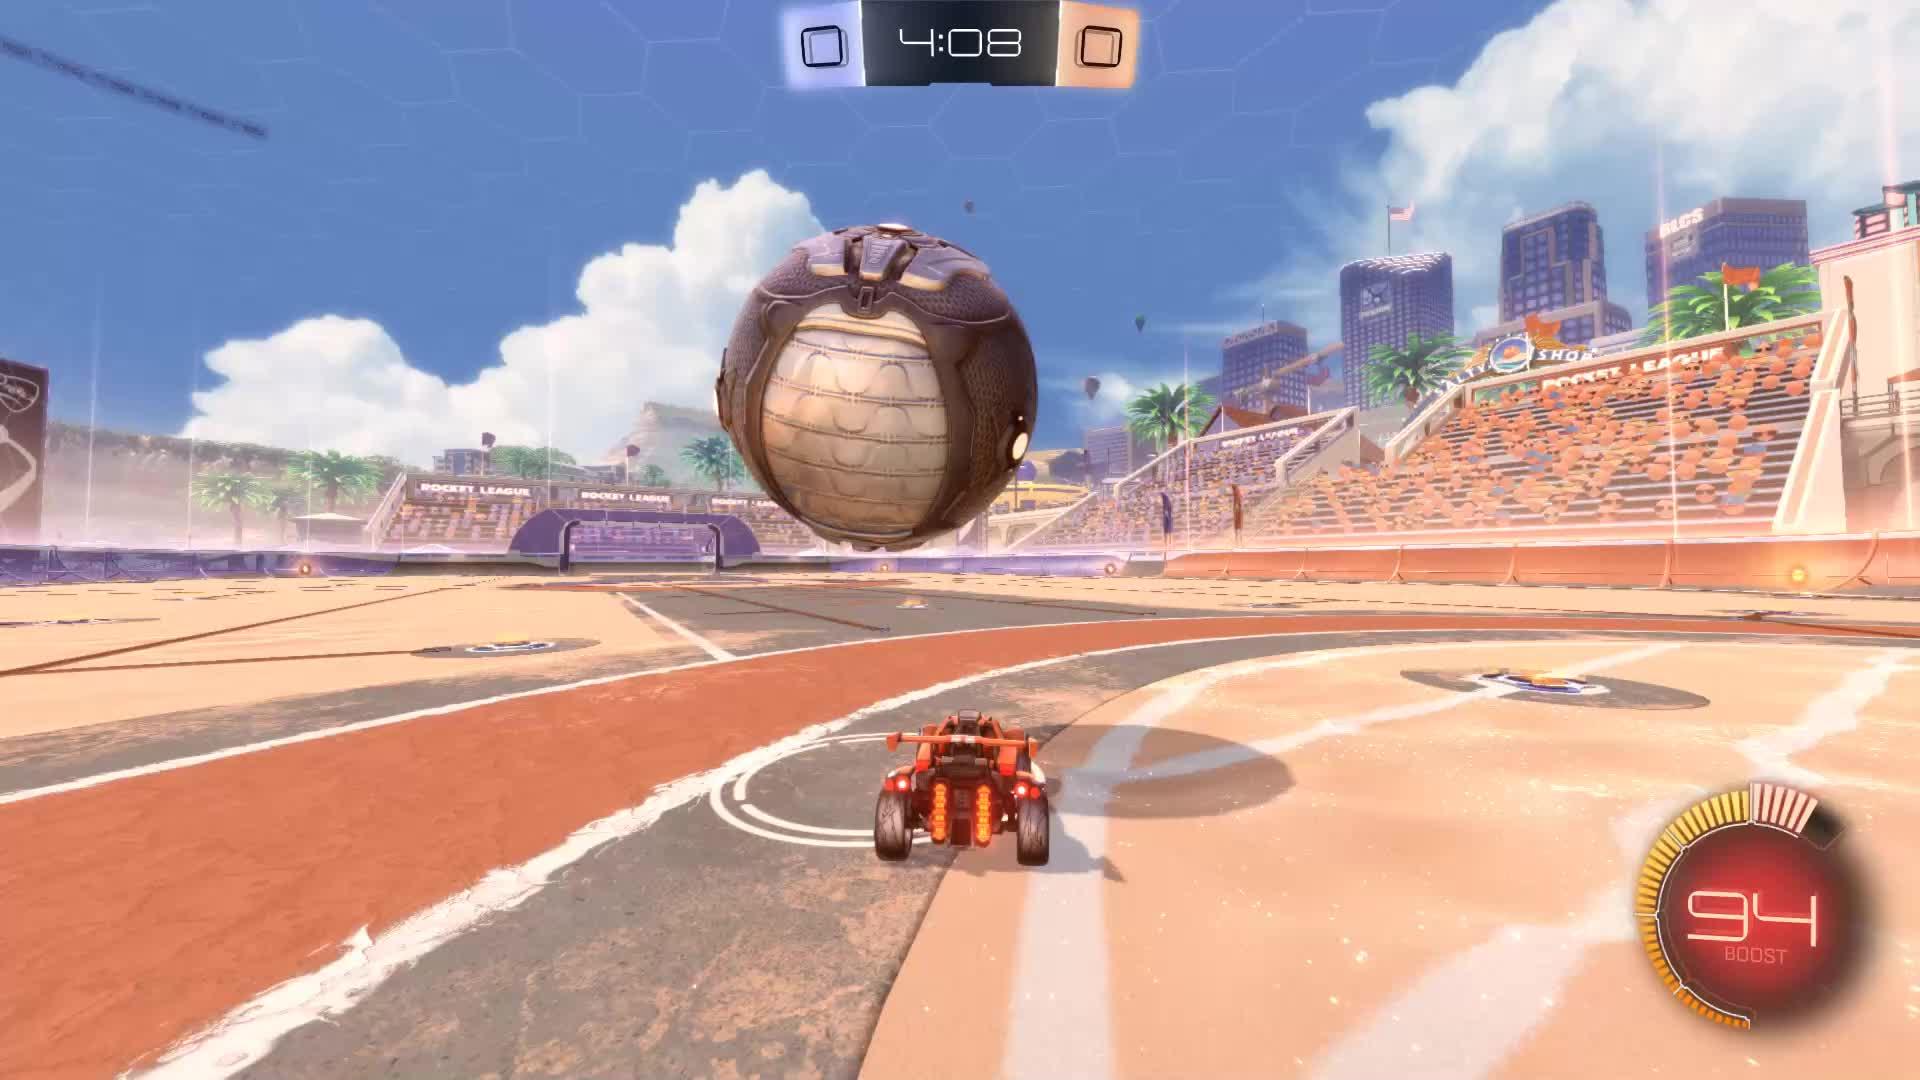 Gif Your Game, GifYourGame, Maik, Rocket League, RocketLeague, Goal 1: Maik GIFs